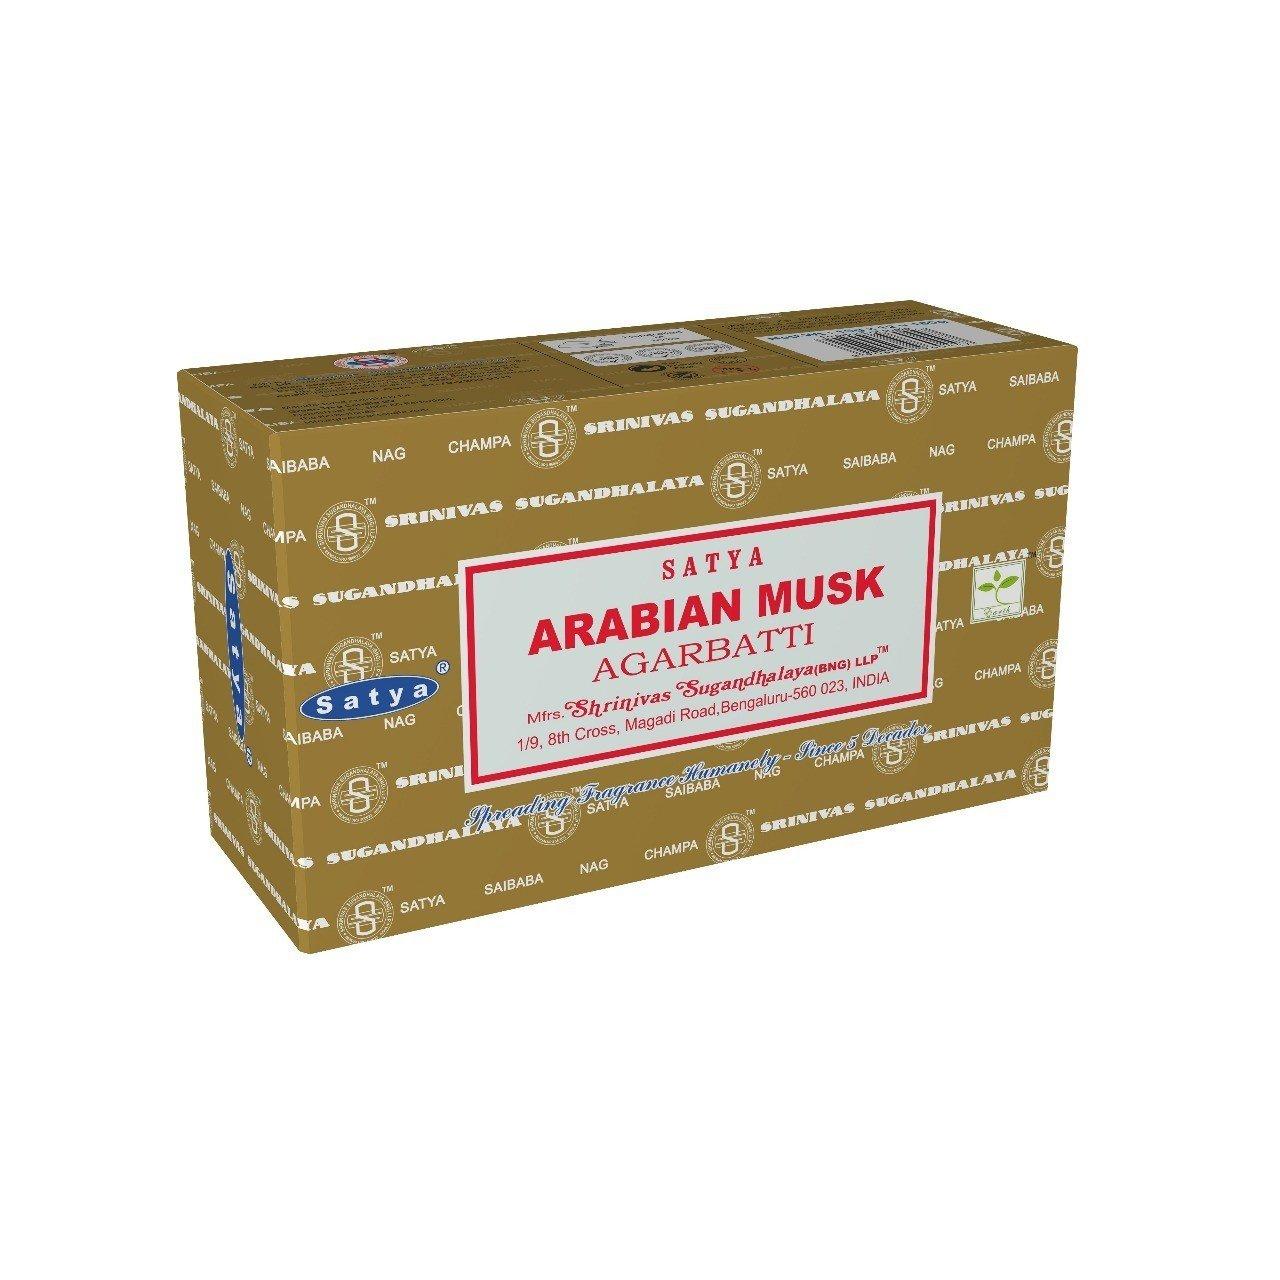 Satya Bangalore (BNG) Arabian Musk Incense Sticks 12 boxes x 15 g (180 grams total)